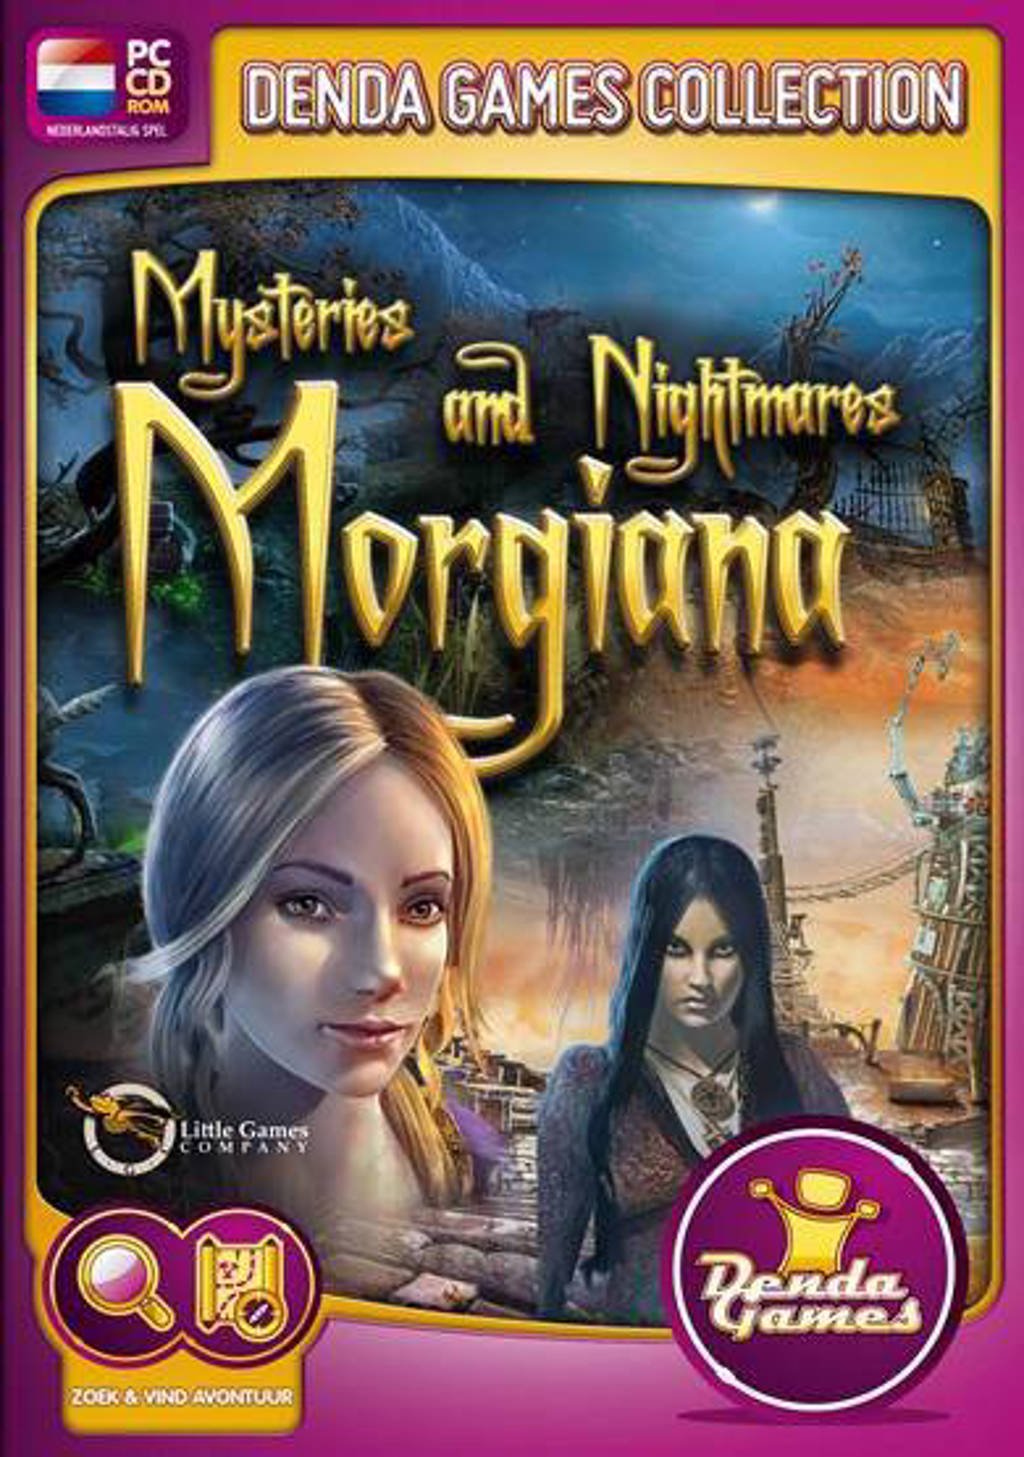 Mysteries and nightmares - Morgiana (PC)